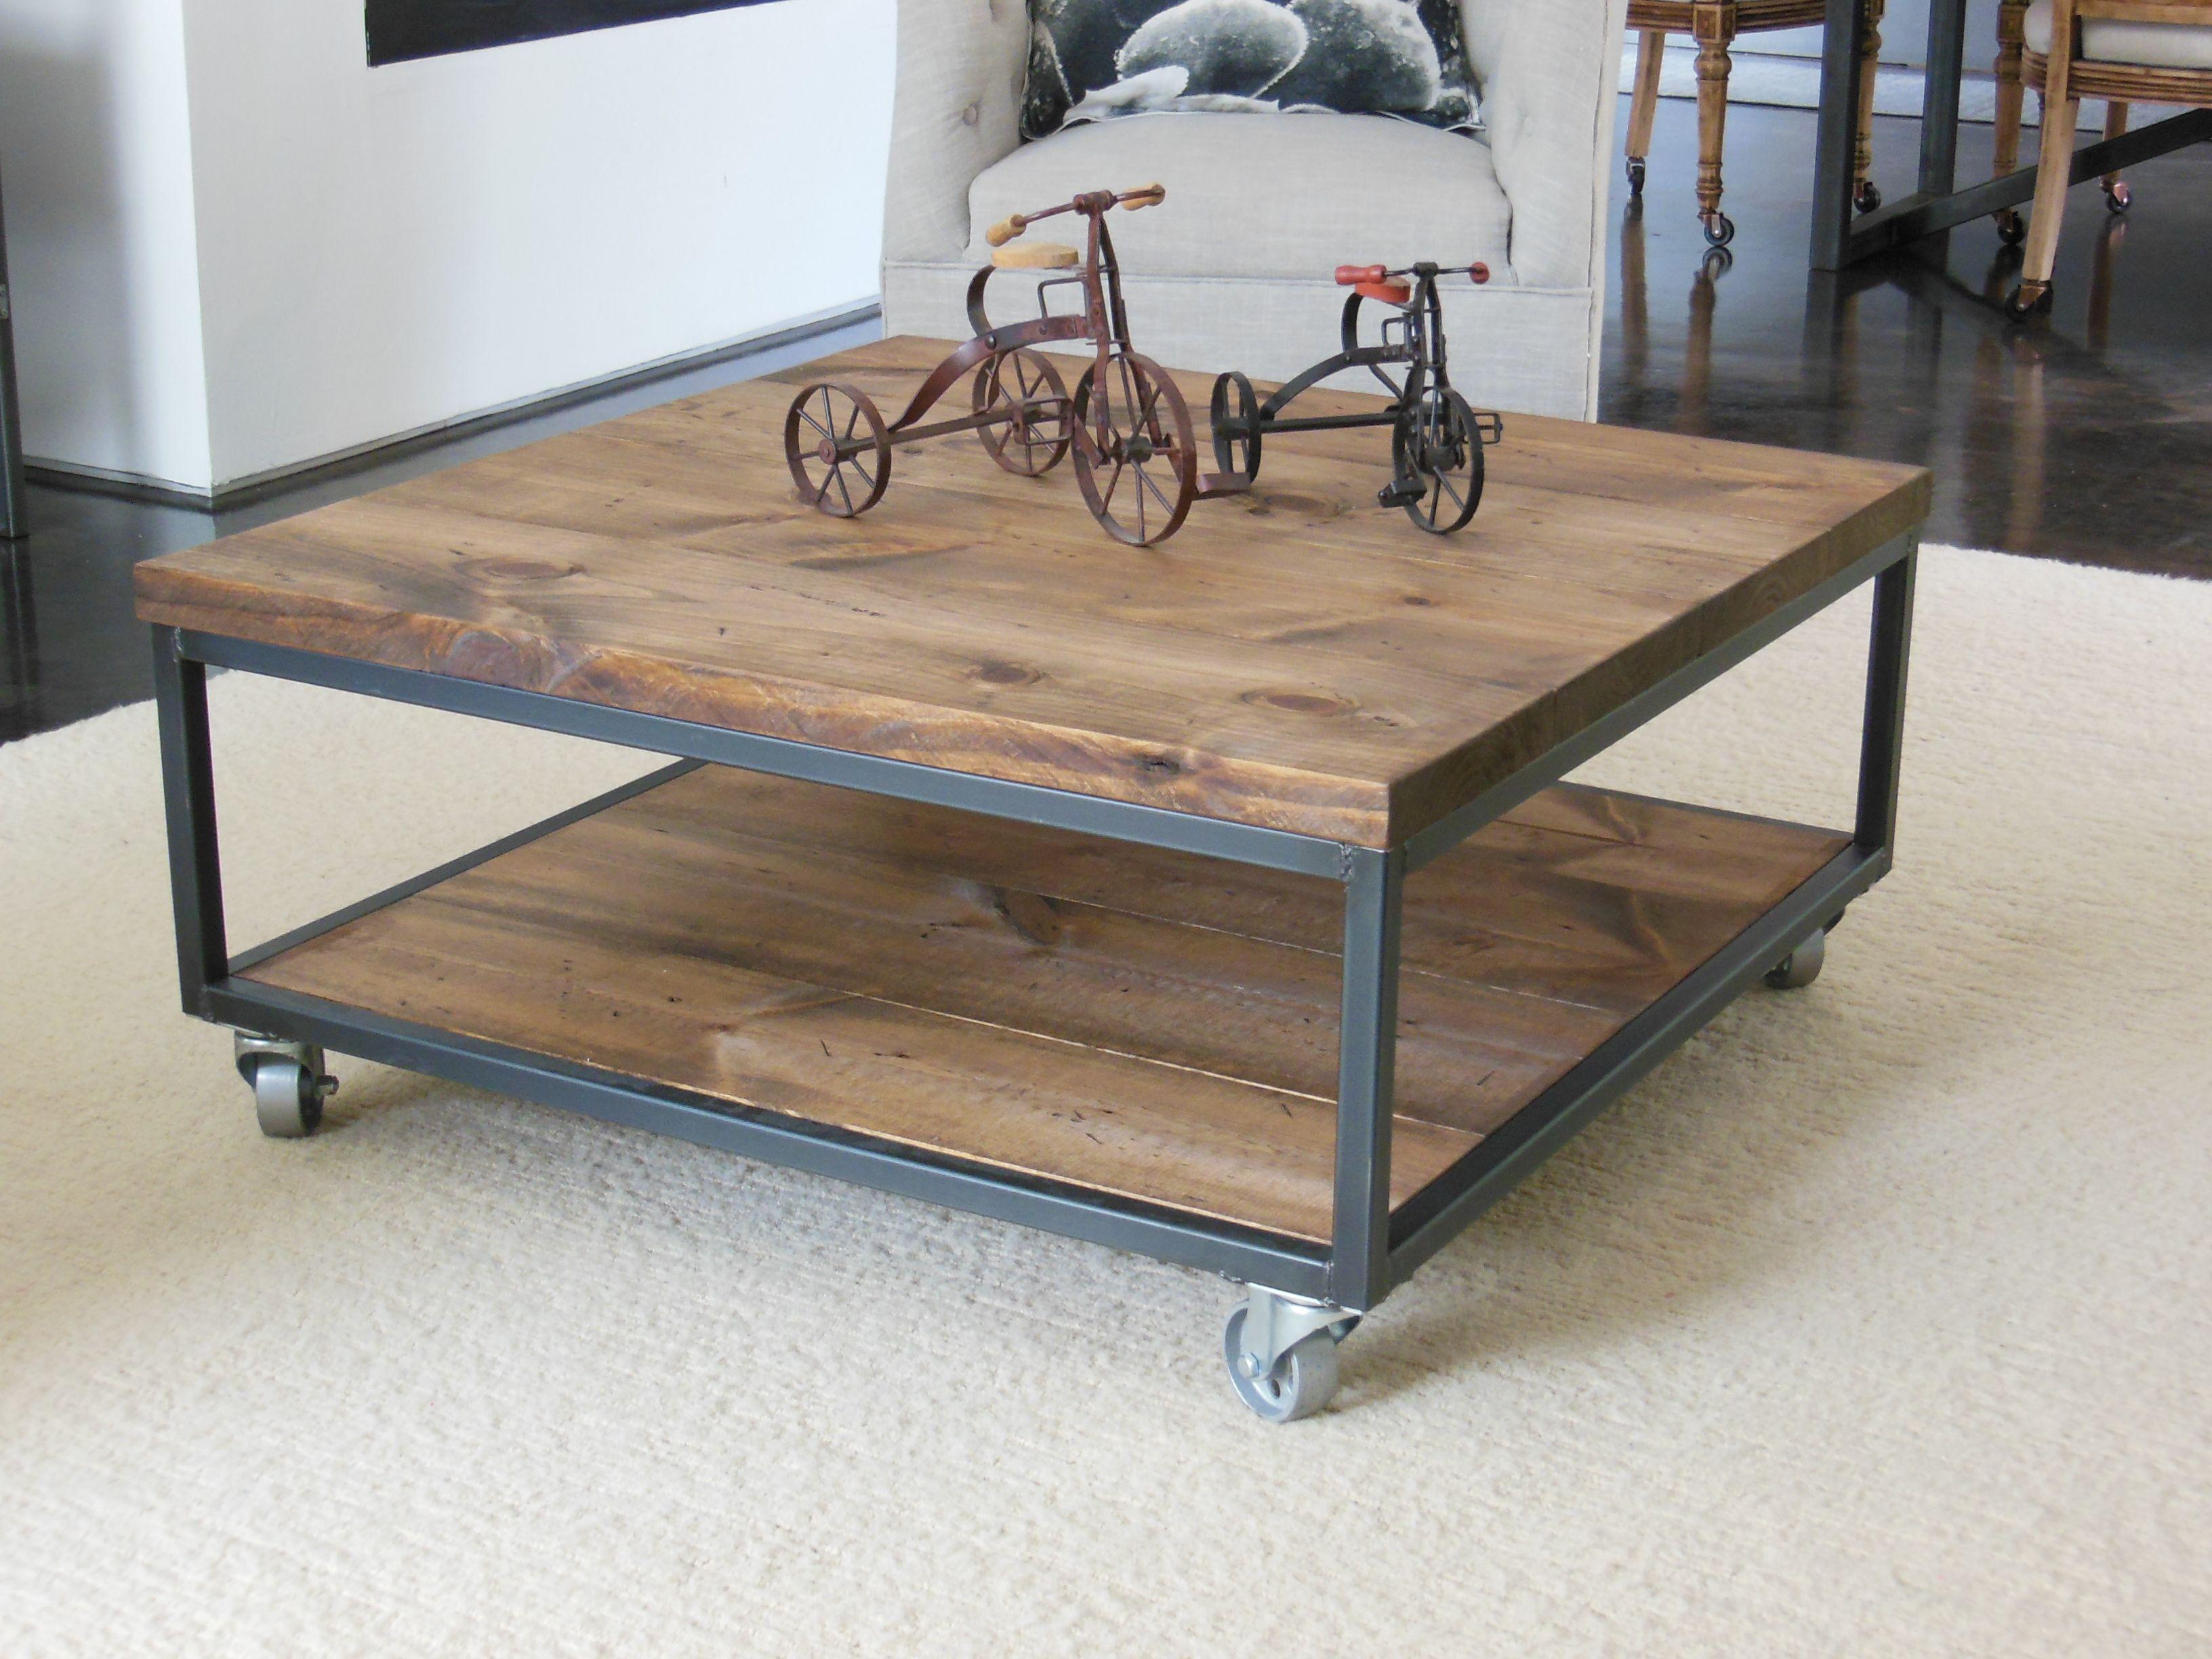 Atico Furniture Square Coffee table Coffee Table